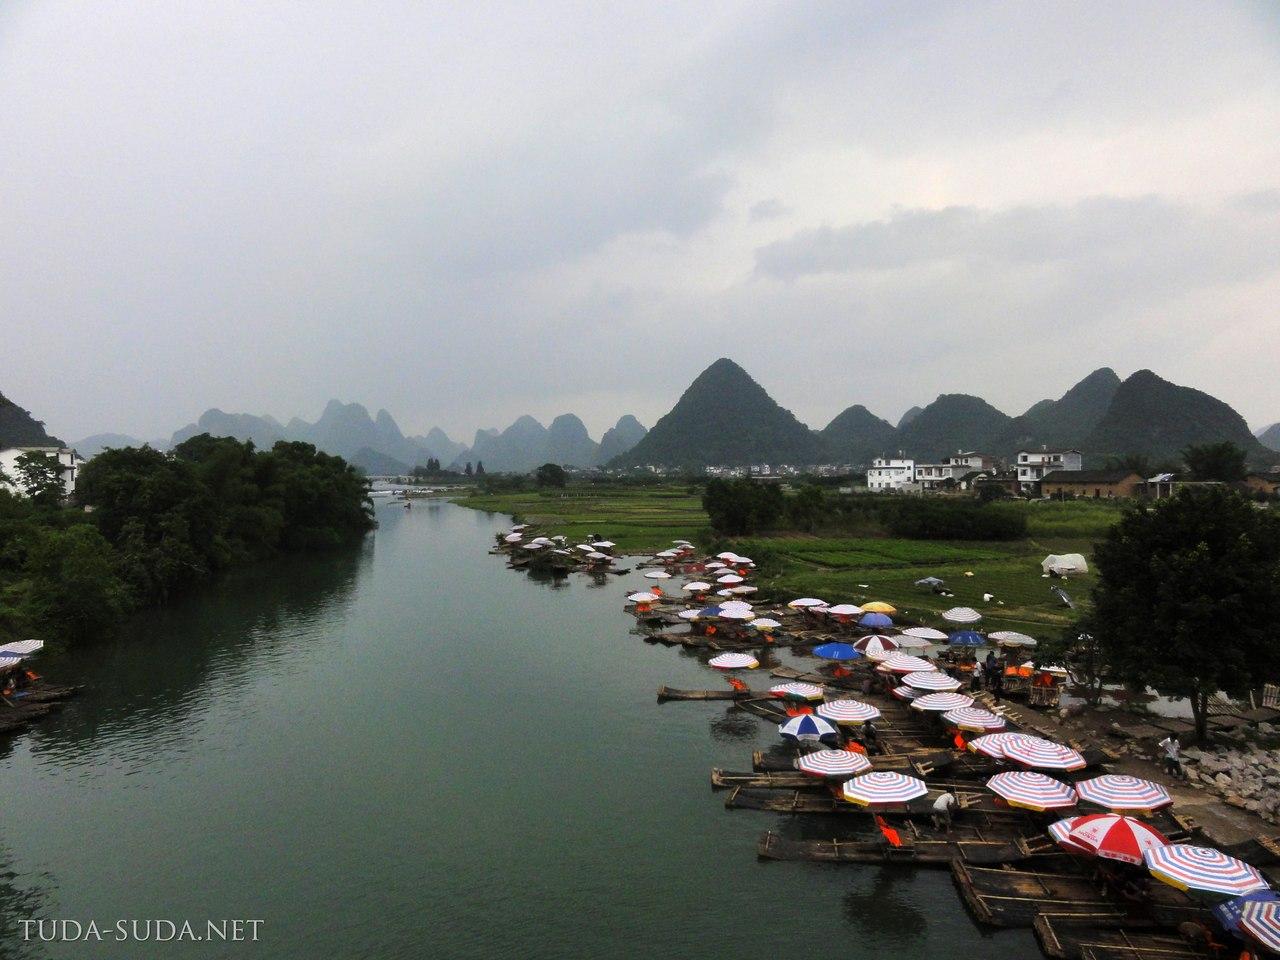 Мост Дракона, Китай